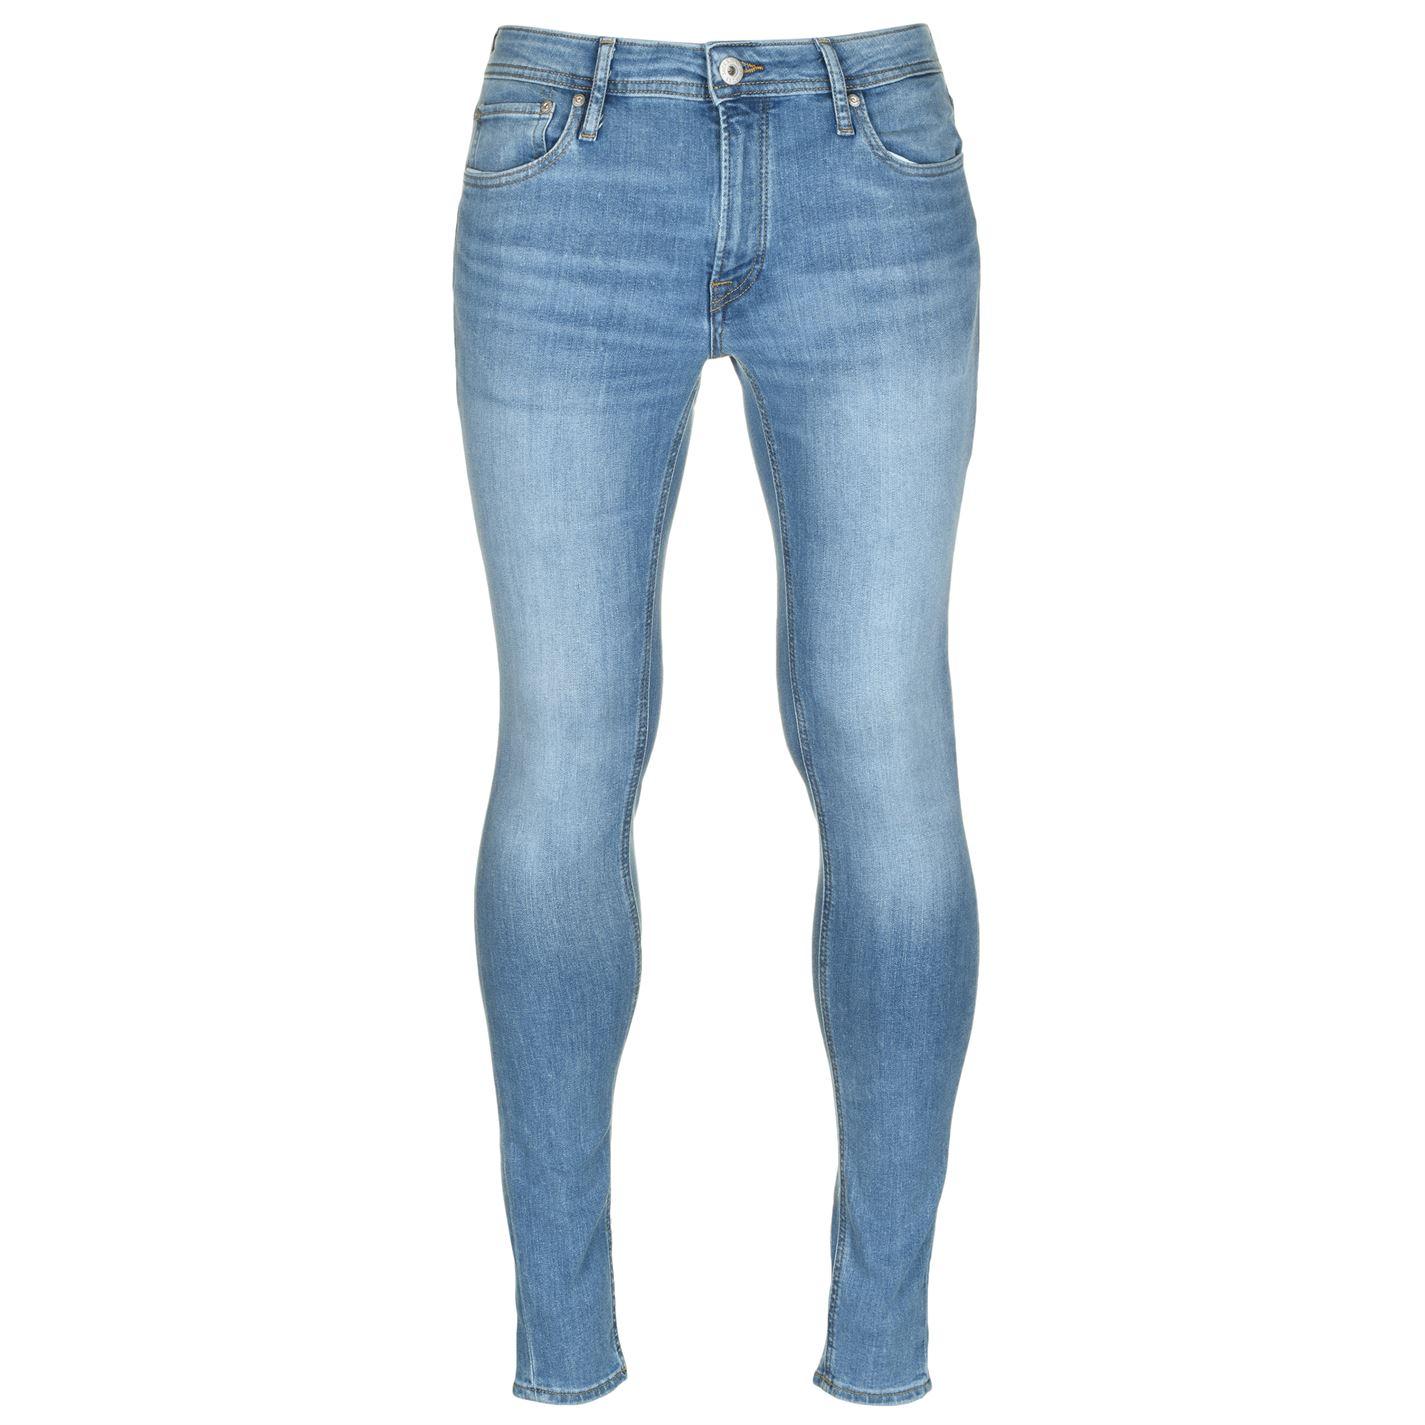 Jack and Jones Jeans Intelligence Tom Skinny Fit Mens Jeans